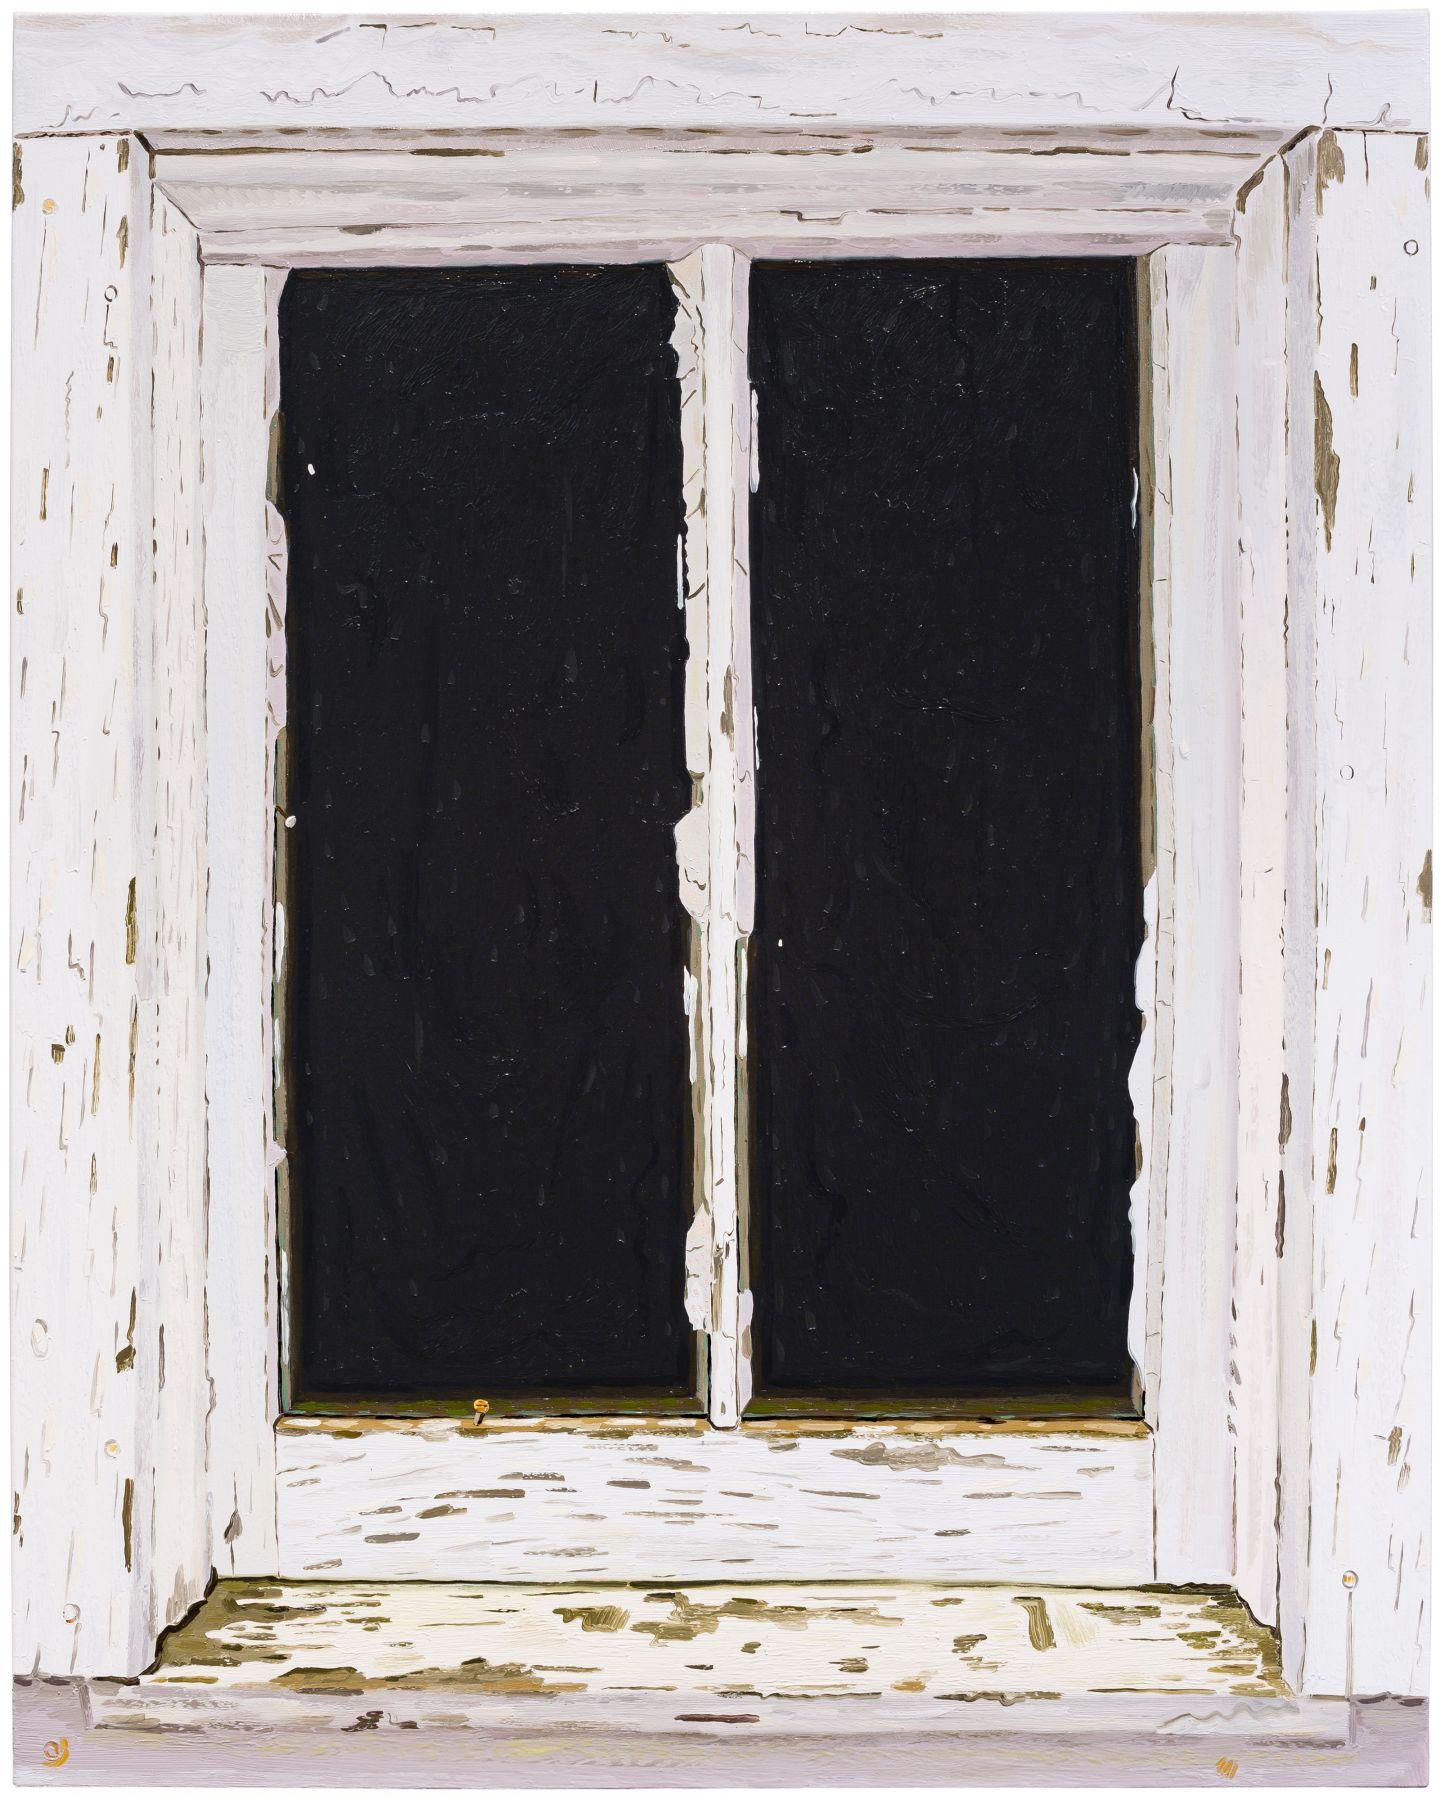 Woodshed Window (April 2018), 2018